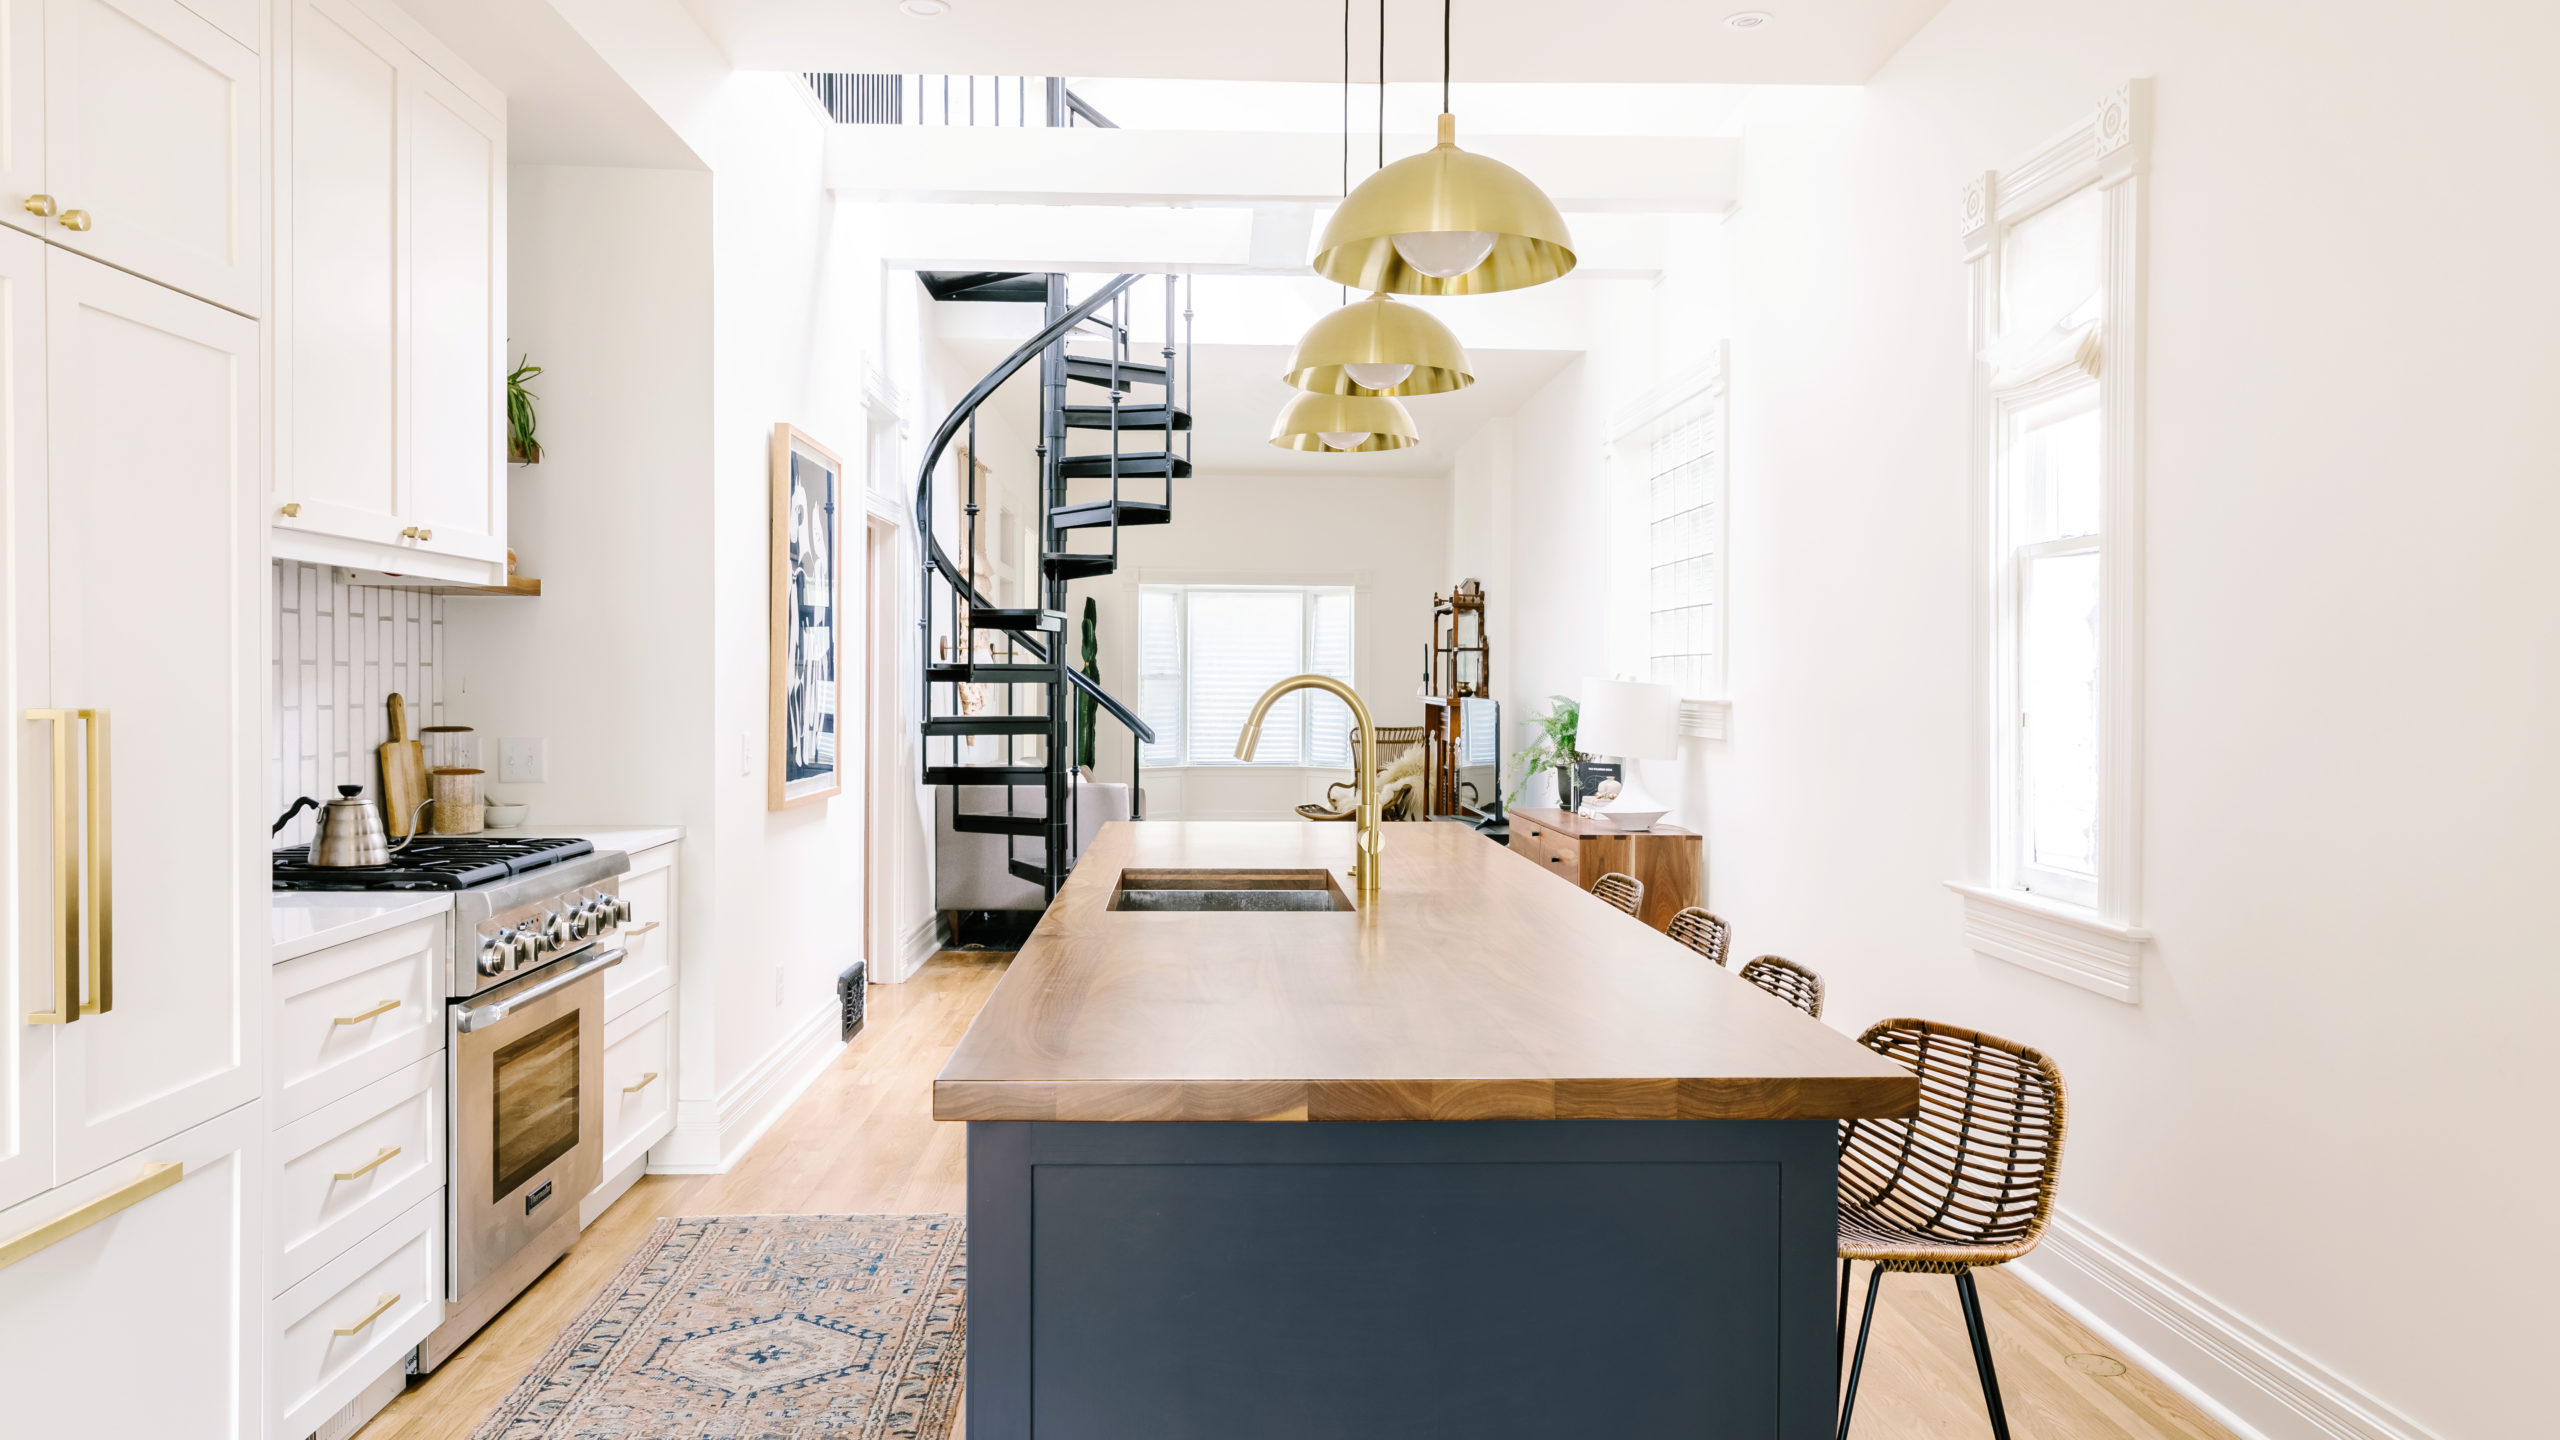 The Best Interior Design Firms in Denver